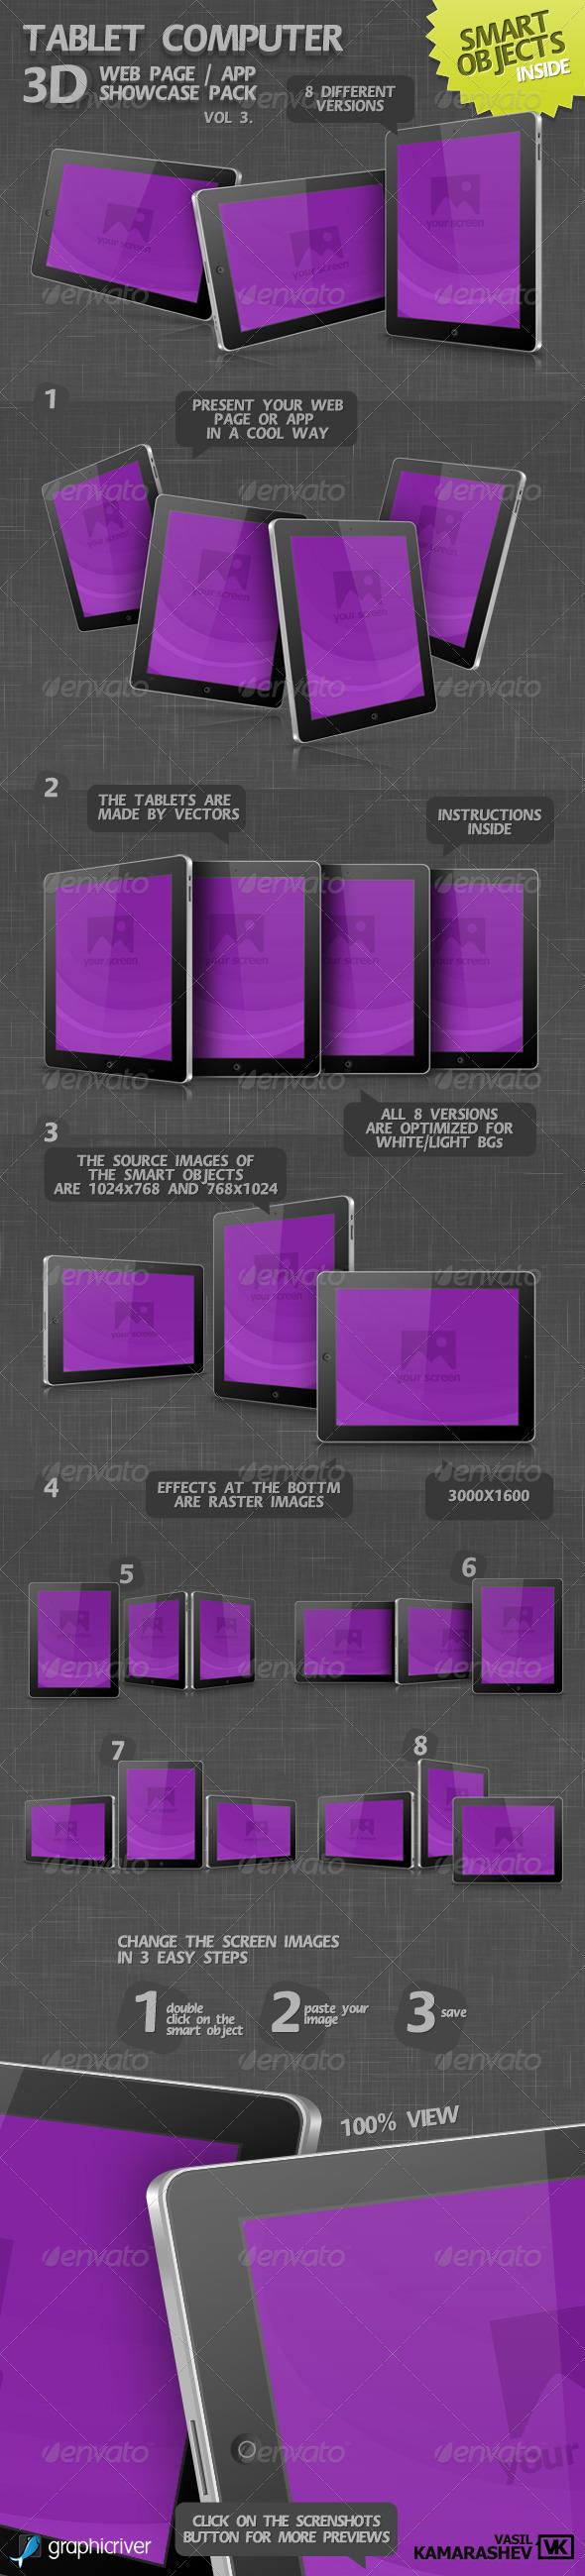 Tablet Computer 3D Web Page / App Showcase Vol.3 - Mobile Displays